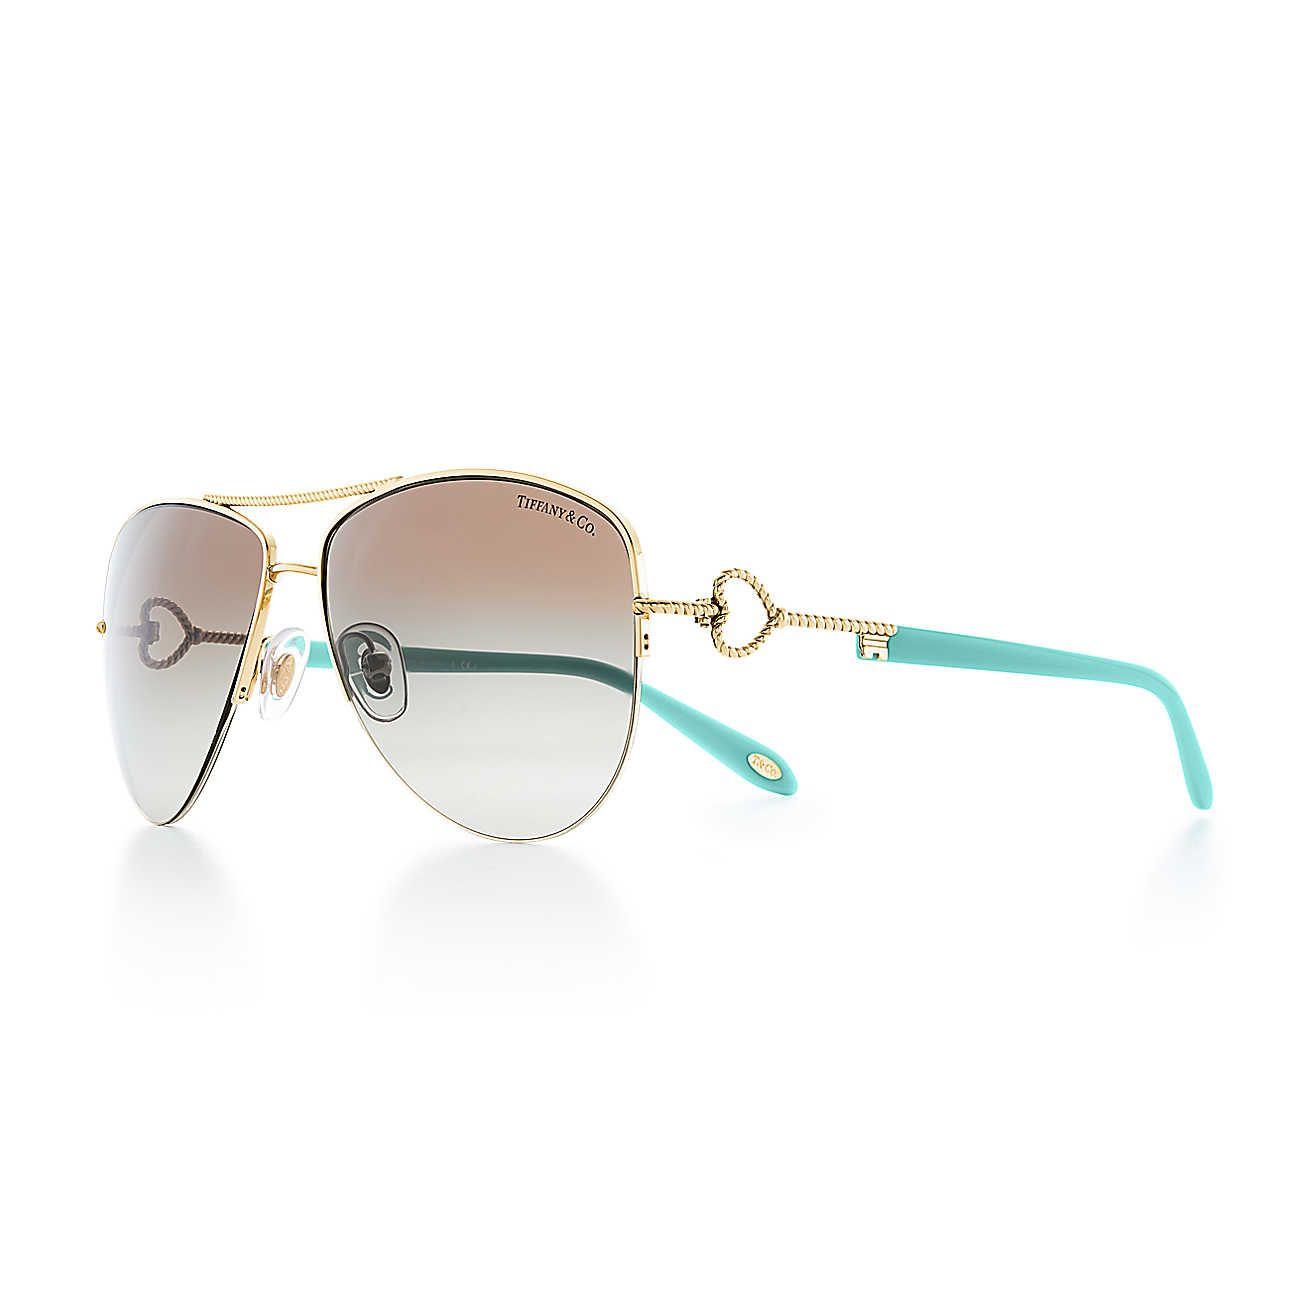 a222dd576a85 Tiffany Twist Aviator Sunglasses in 2019